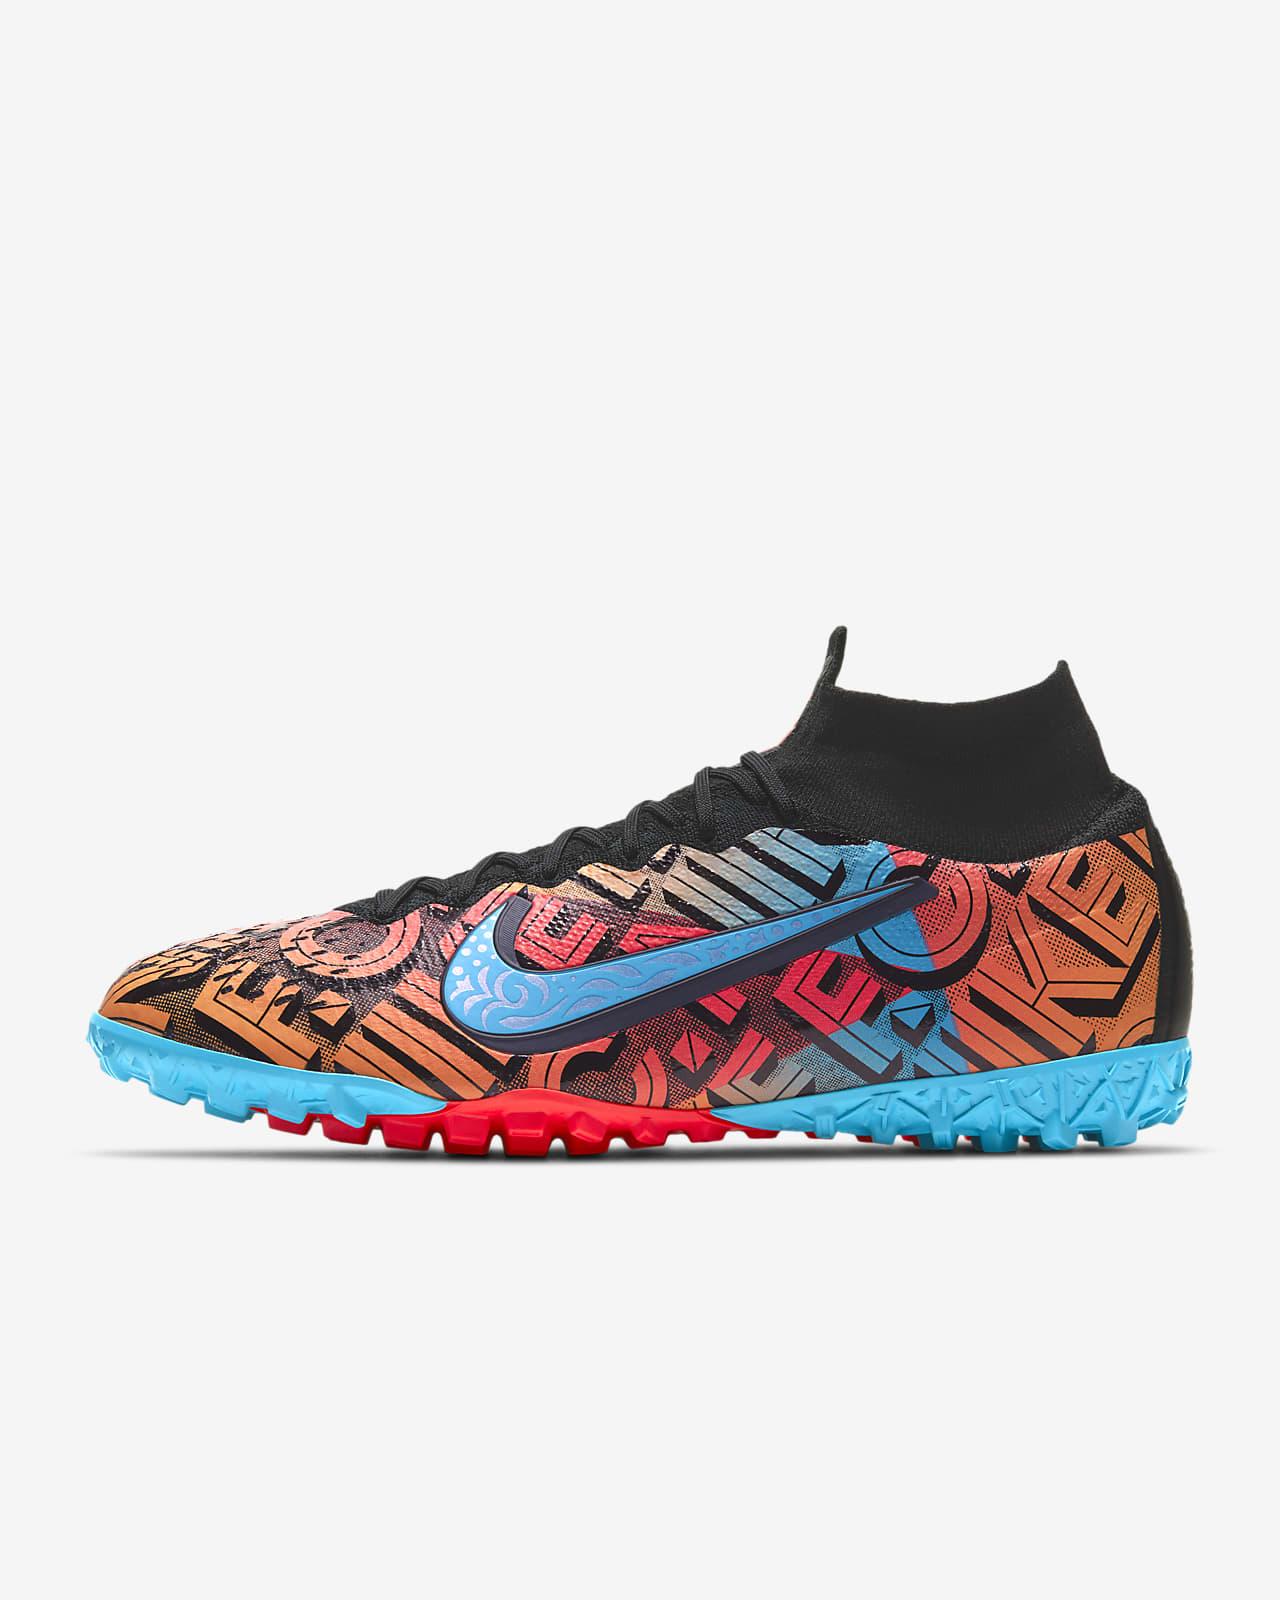 Nike Superfly 7 Elite CL TF 男/女人造场地足球鞋